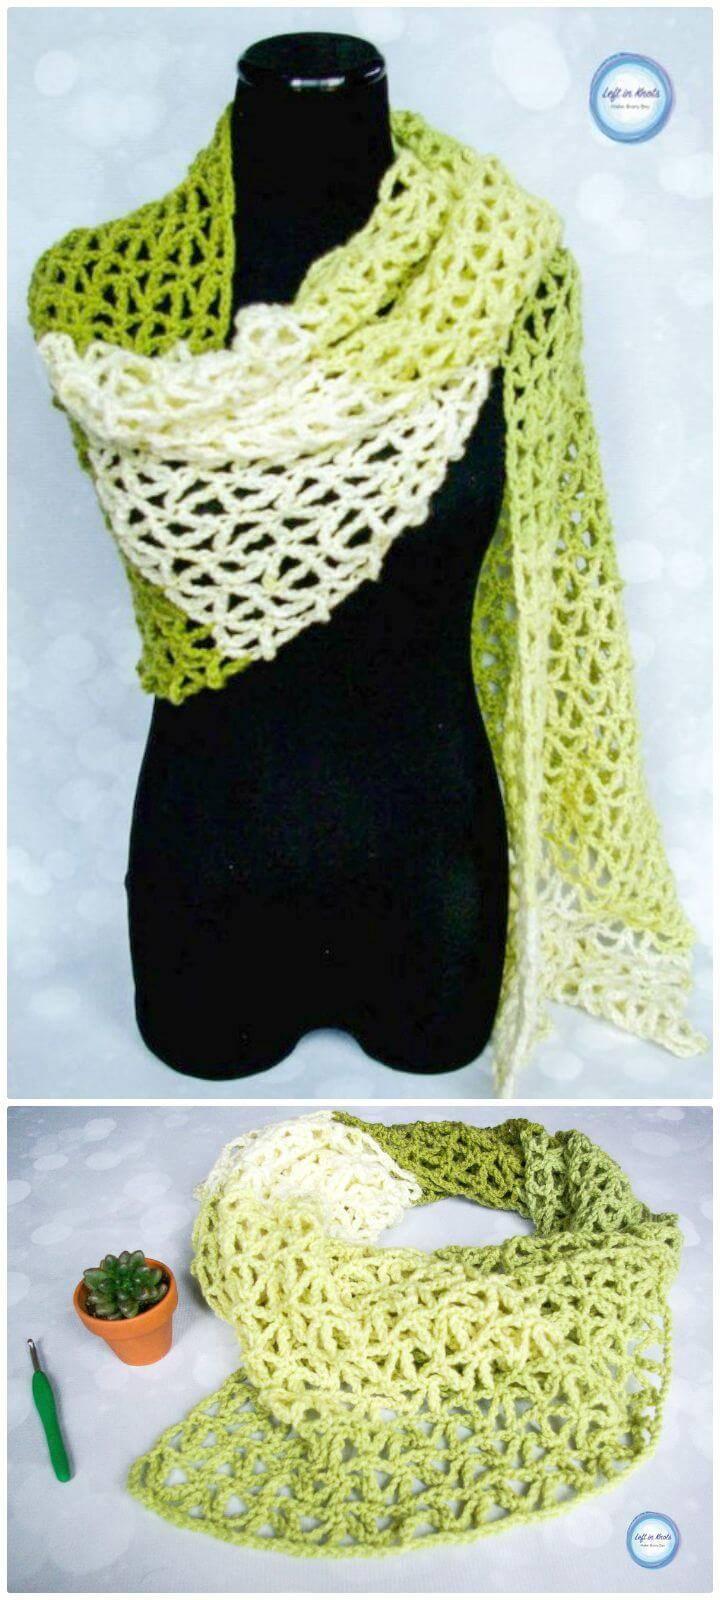 How To Free Crochet Greenery Wrap Pattern - Caron Cakes Yarn